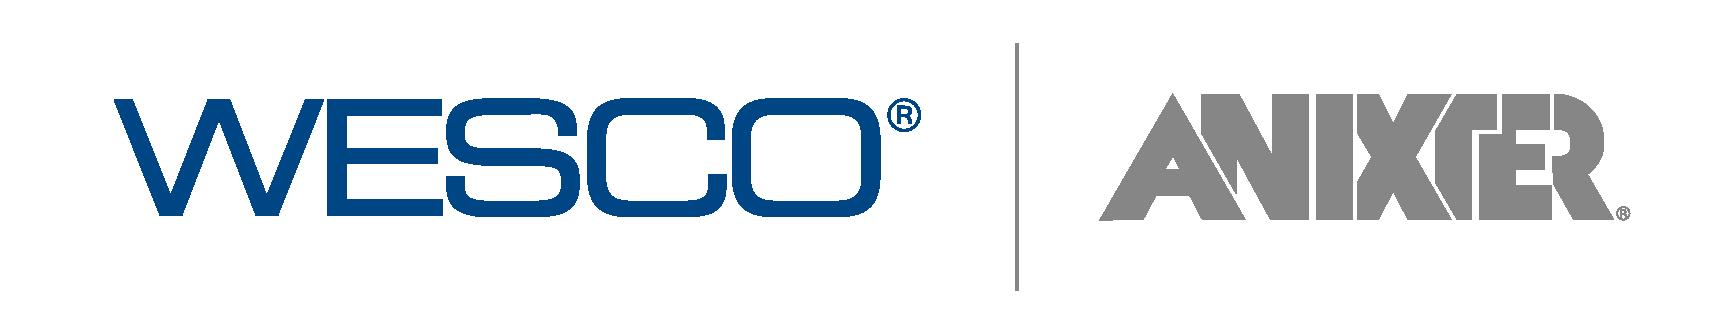 Anixter-Wesco-logo-01.png